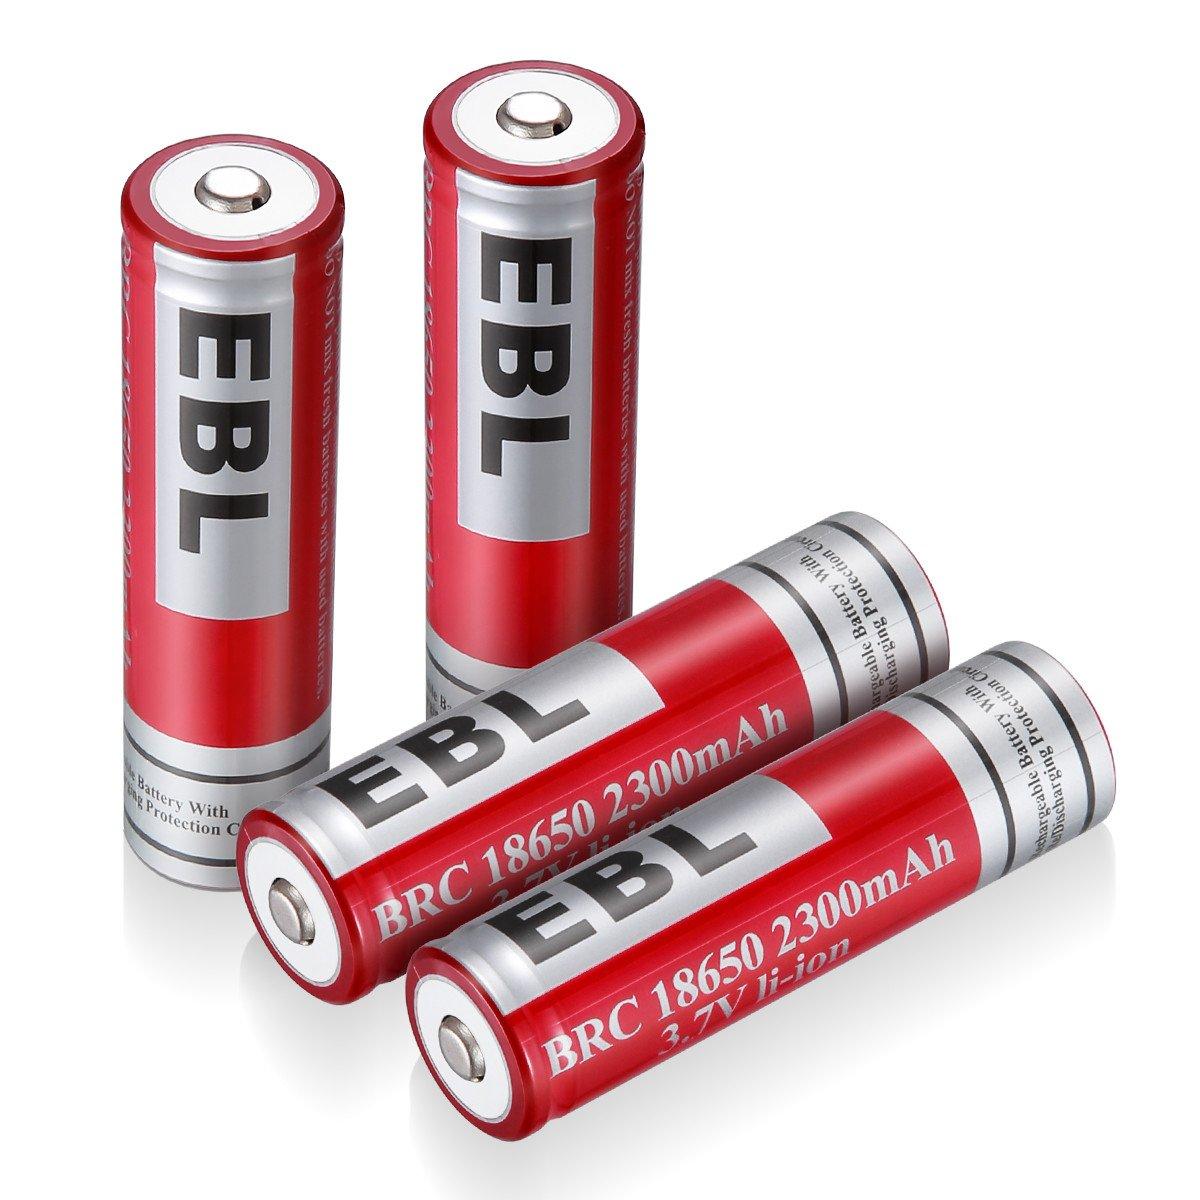 EBL 18650 Akkus 2300mAh 3.7V Li-Ionen wiederaufladbare Akkus 4 Stück